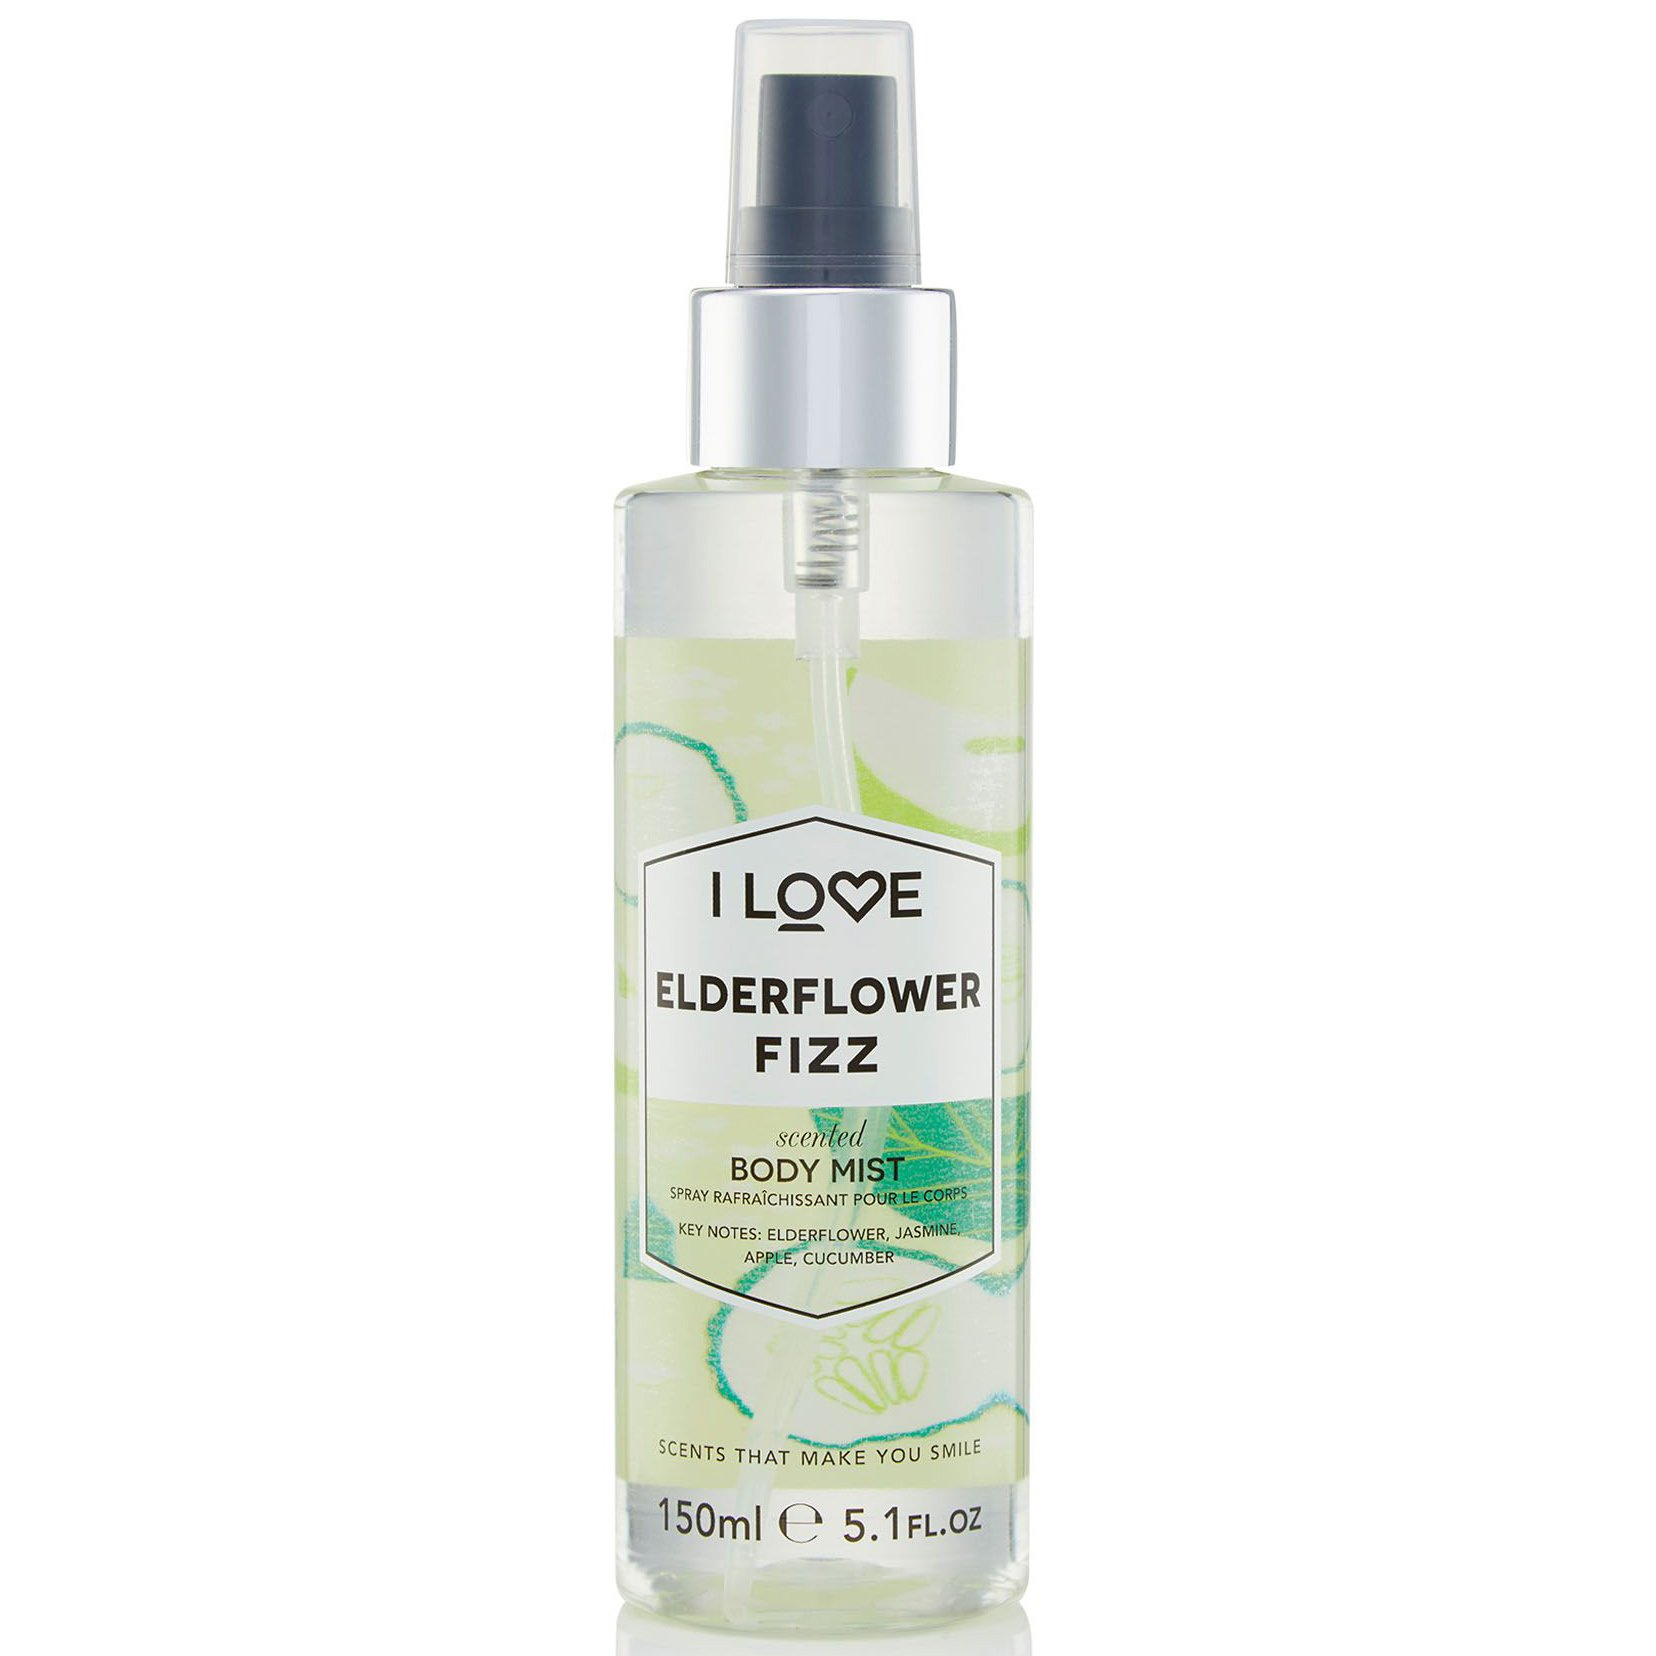 I love... Elderflower Fizz Scented Body Mist Αρωματικό Spray Σώματος με Δροσερές ομορφιά   αρώματα   αρώματα για τη γυναίκα